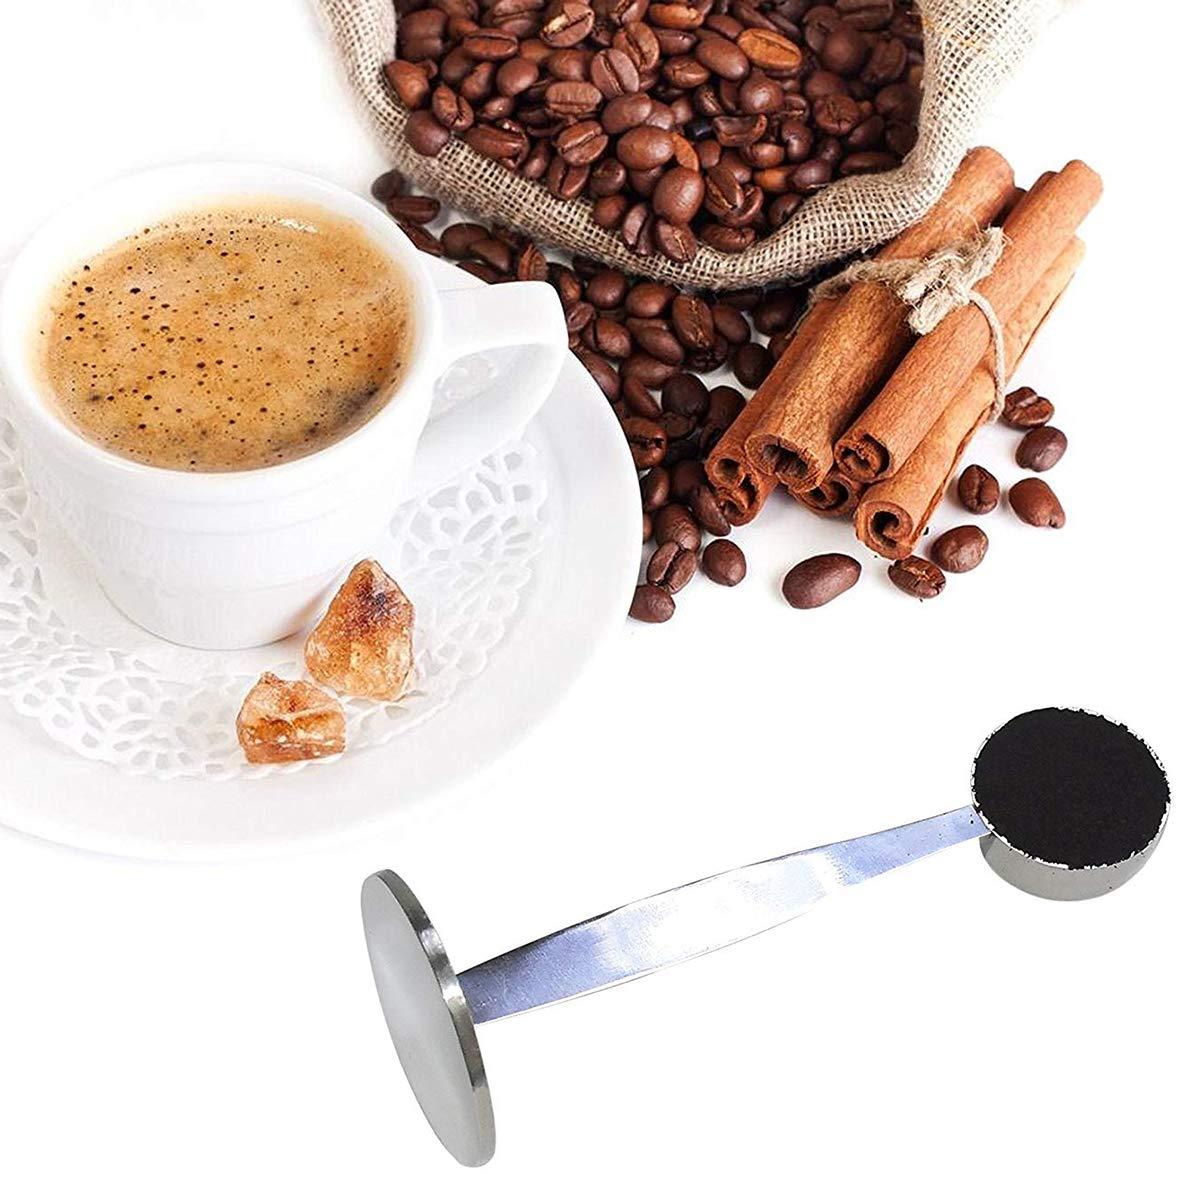 Espresso Staender Kaffee Mass Tamper Loeffel Edelstahl Kaffee /& Tee Werkzeuge 1A